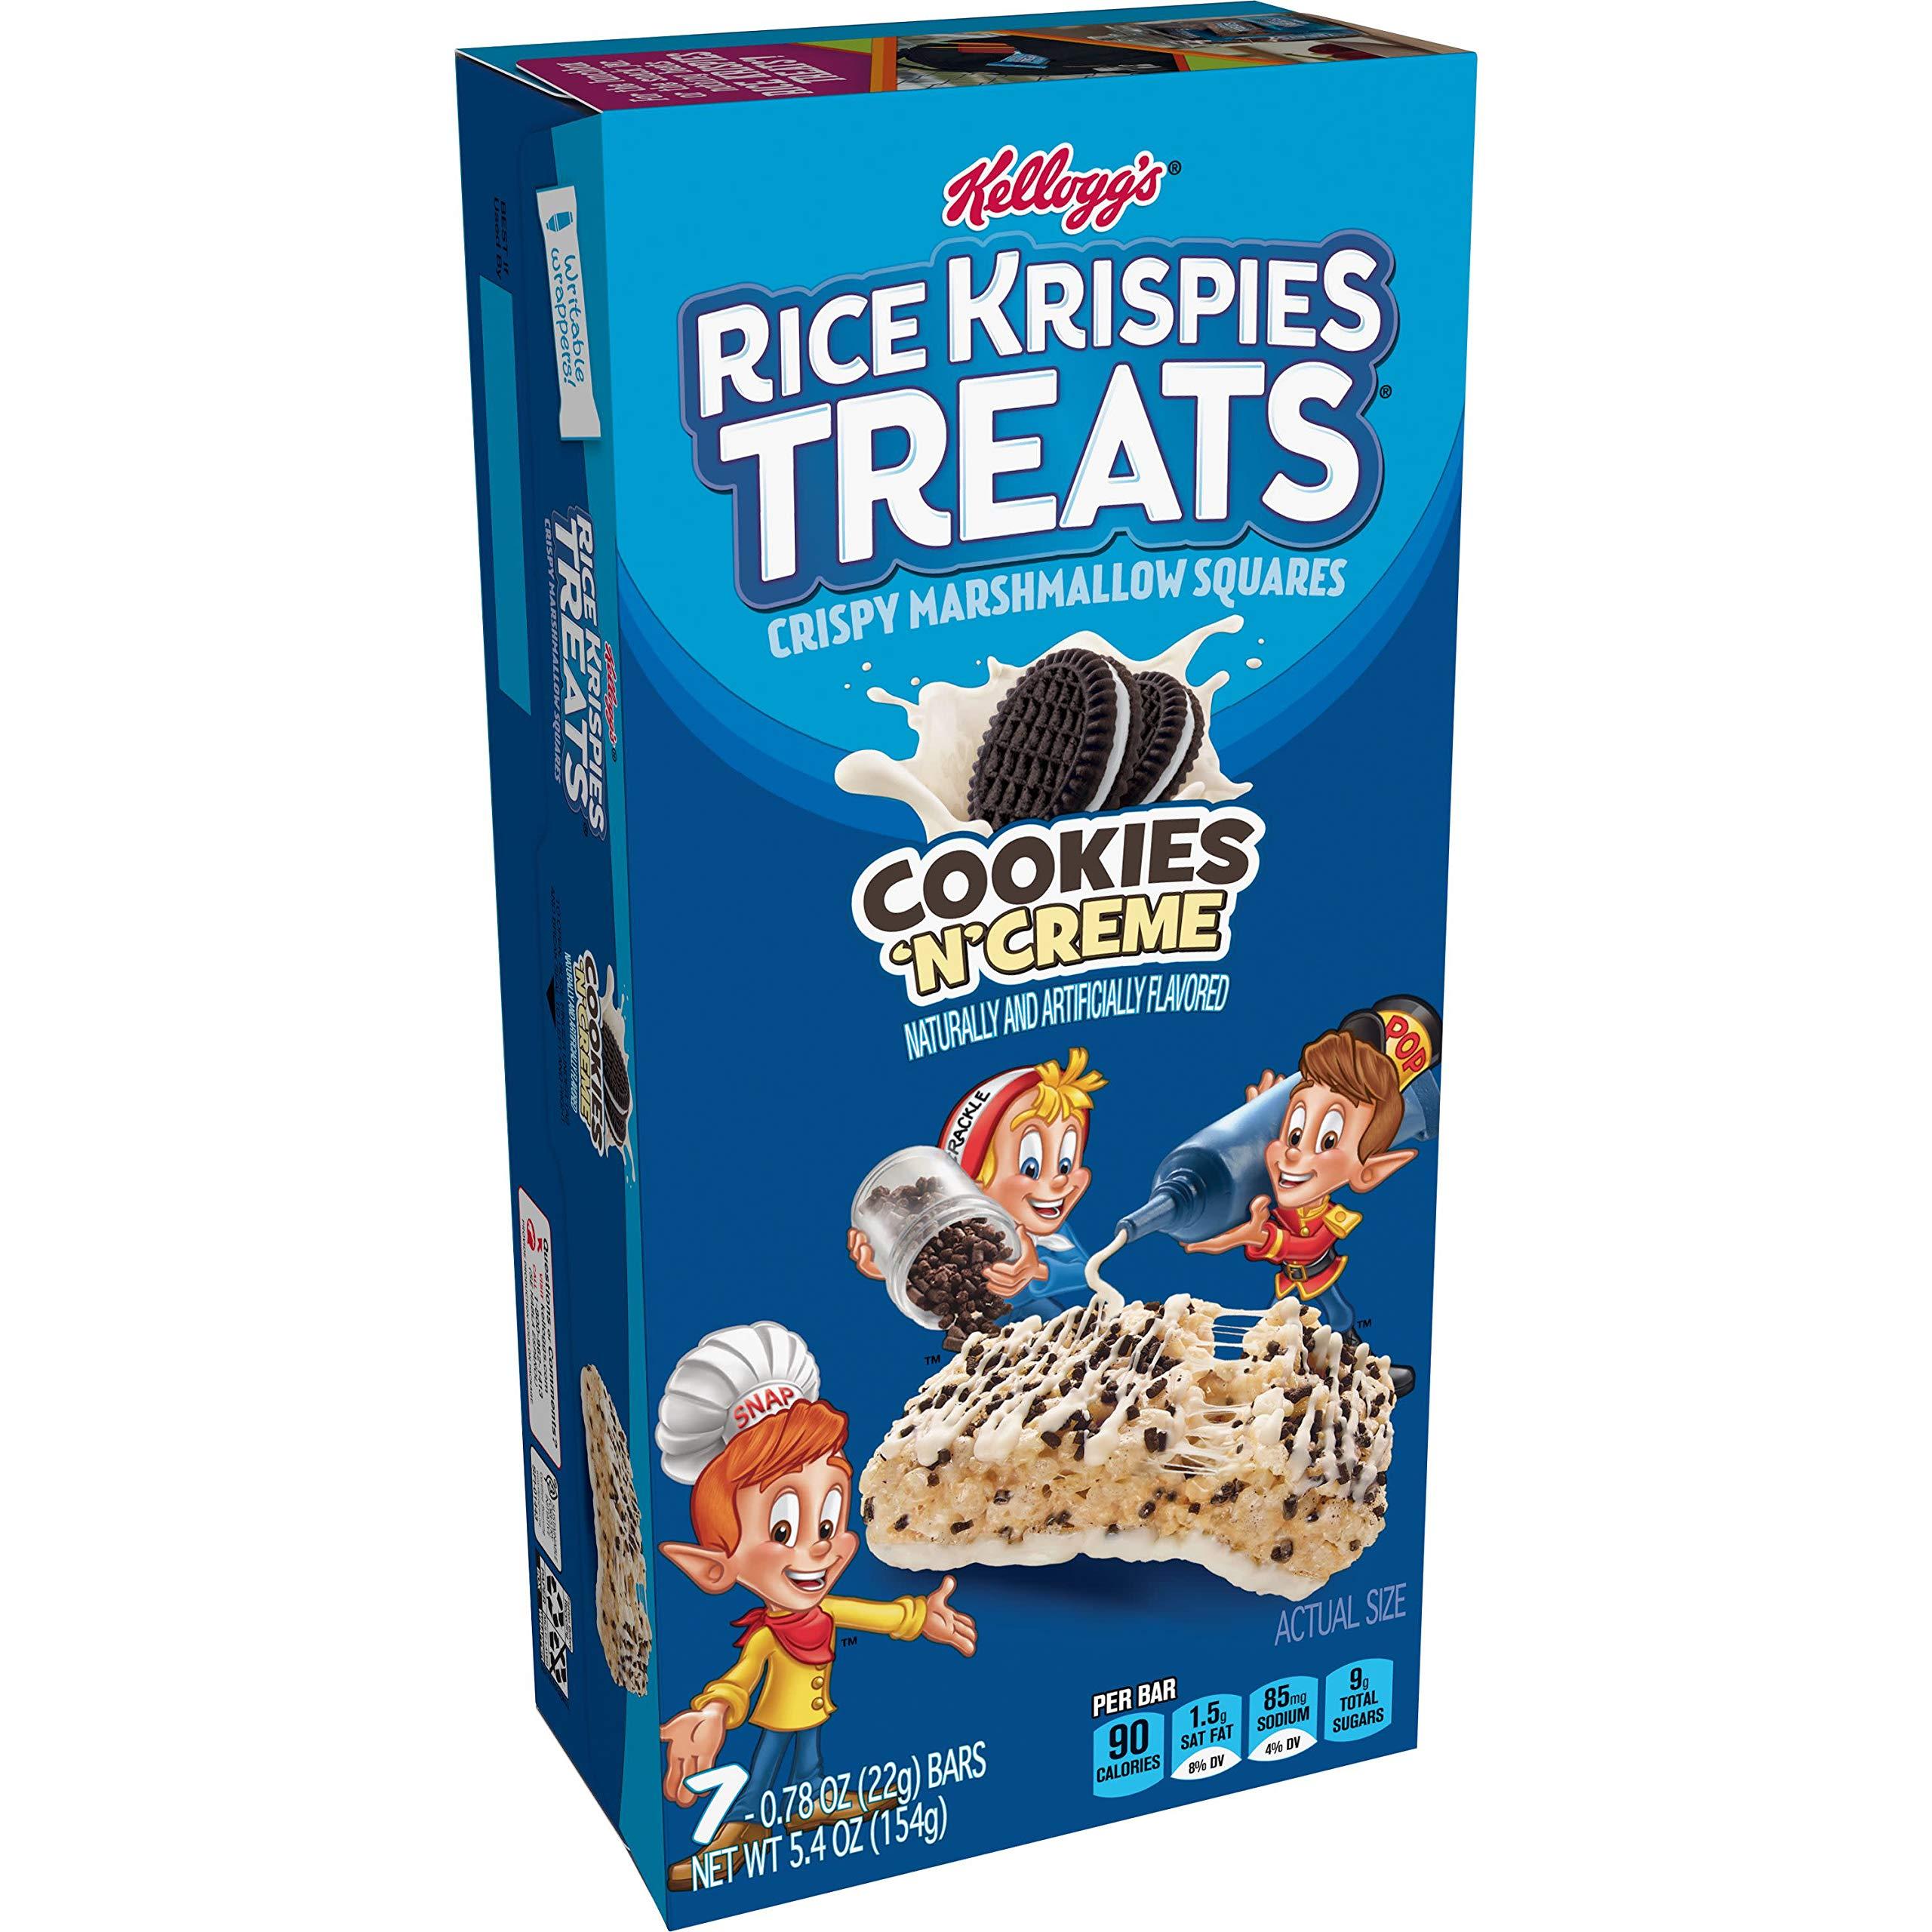 Kellogg's Rice Krispies Treats, Crispy Marshmallow Squares, Cookies 'N' Creme, 5.4oz Box (7 Count)